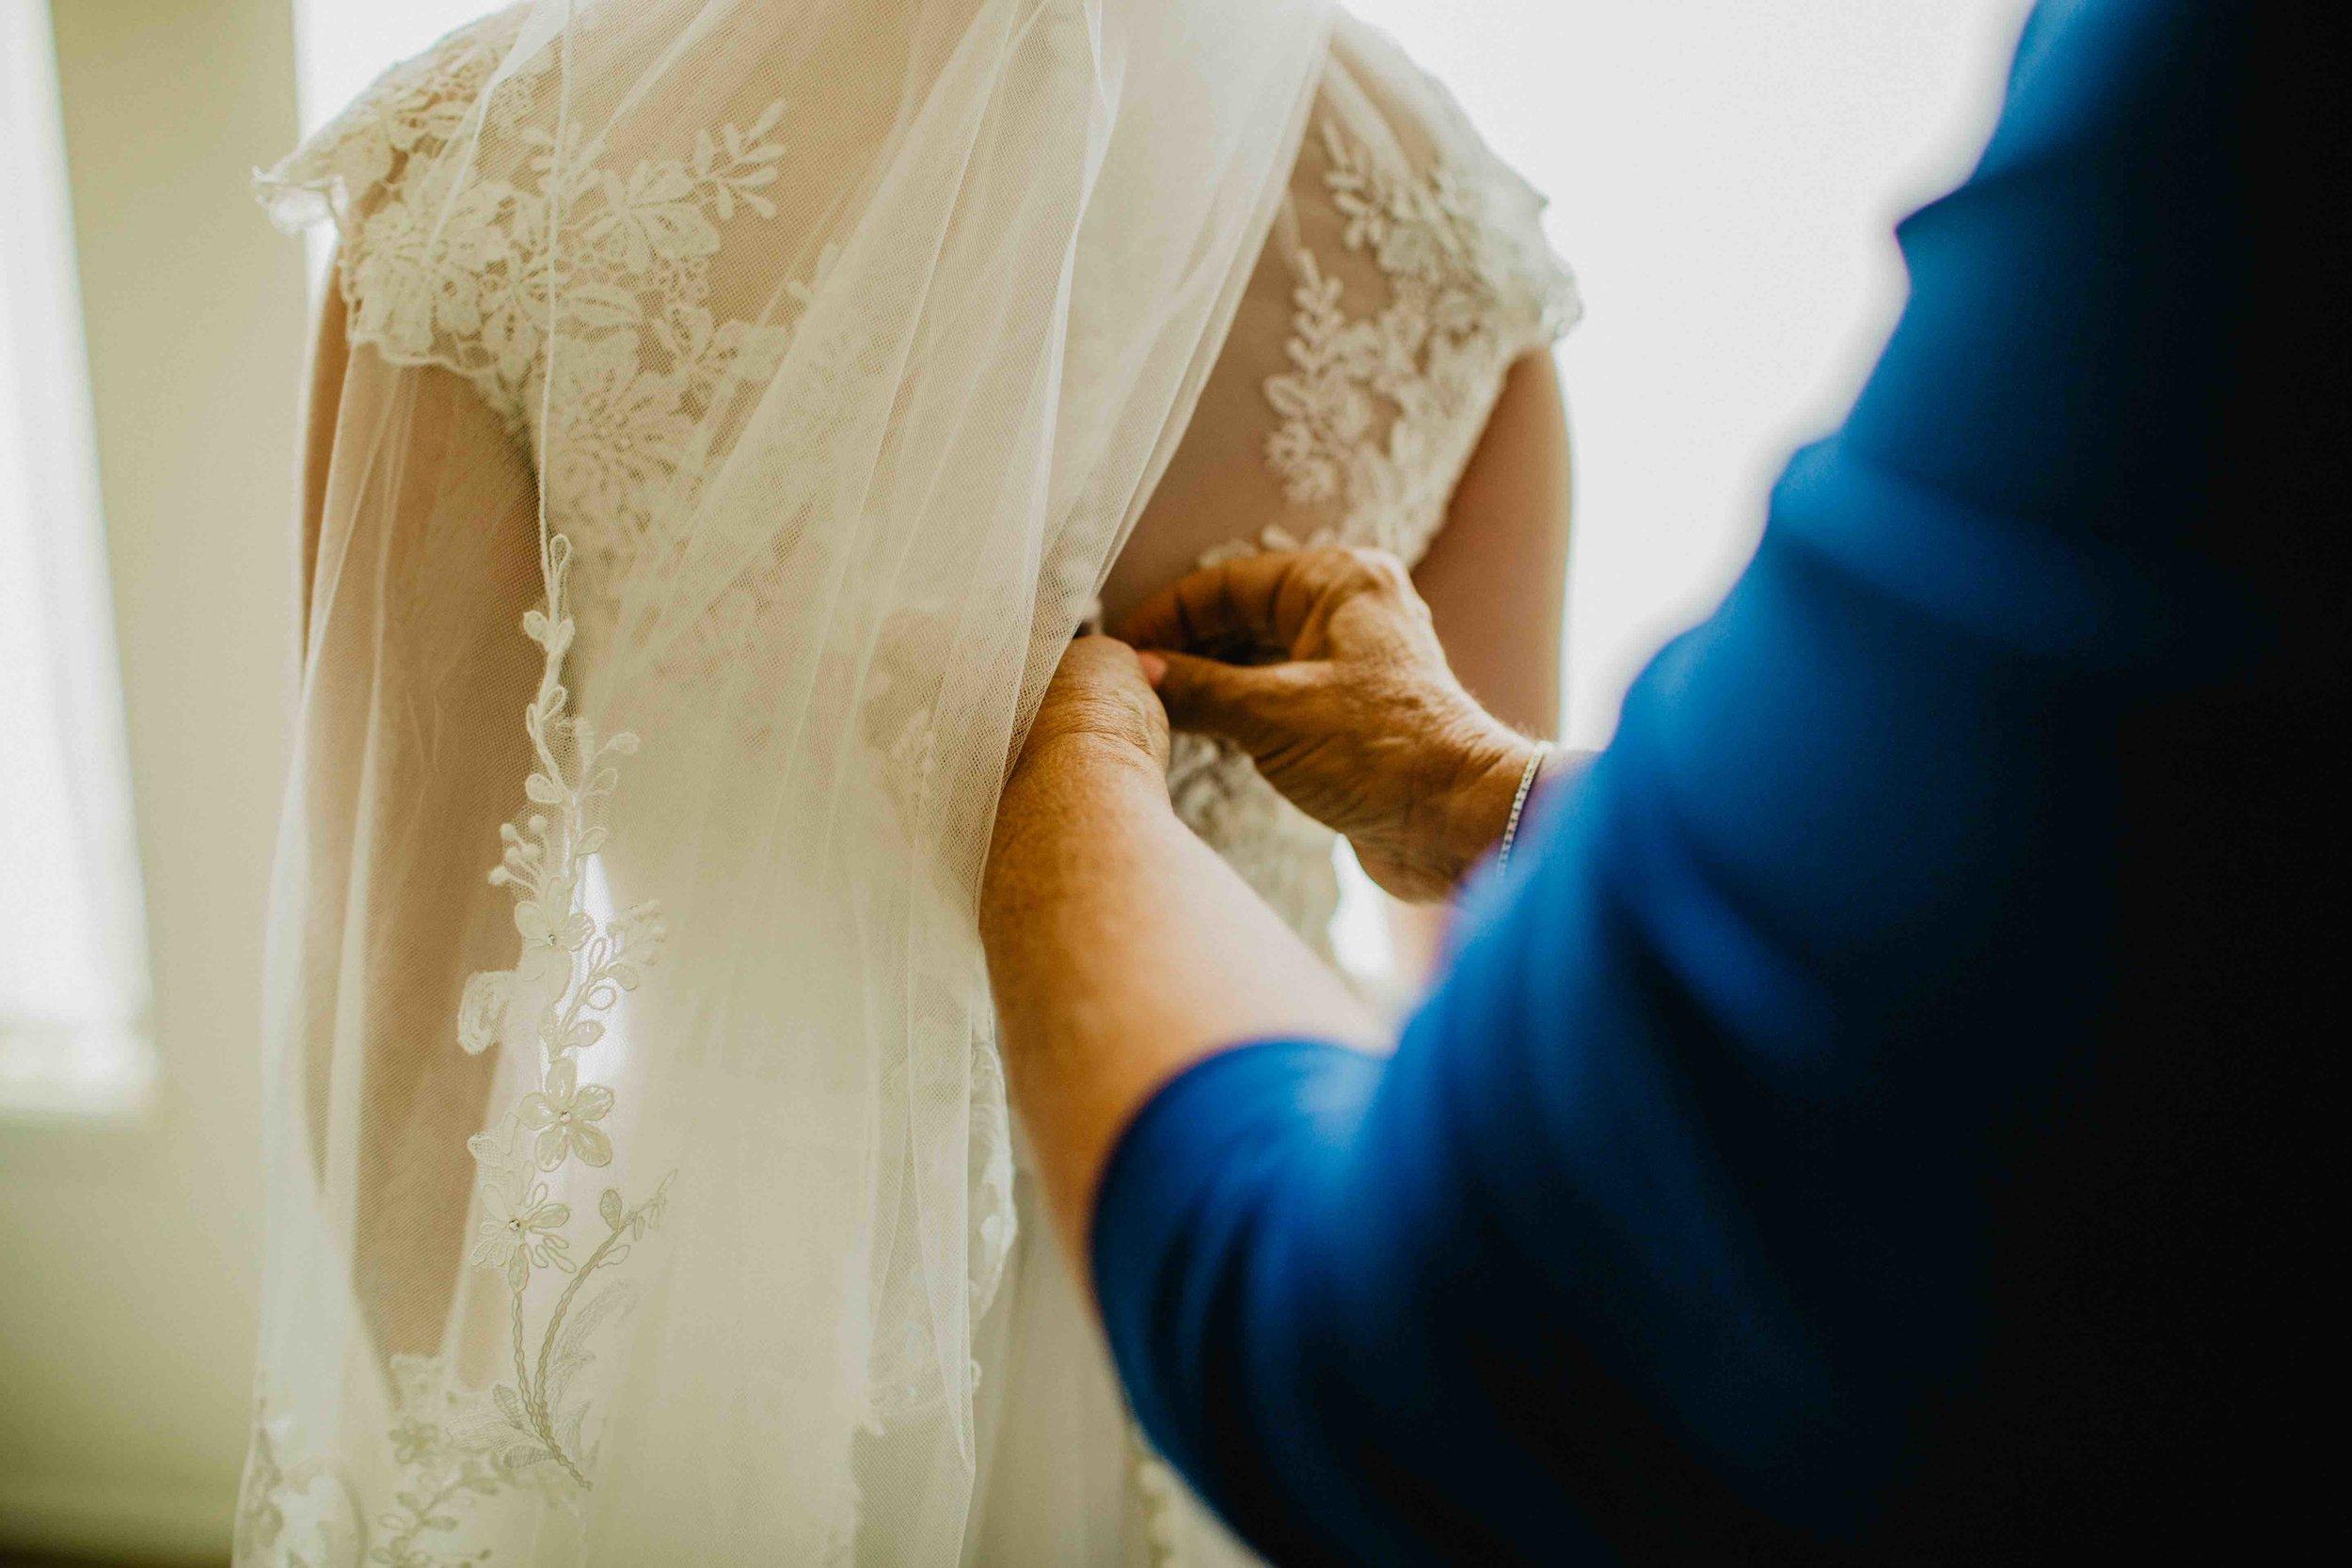 607A5320-colorado-wedding-photographer-denver-springs-vail--colorado-wedding-photographer-denver-springs-vail-.jpeg